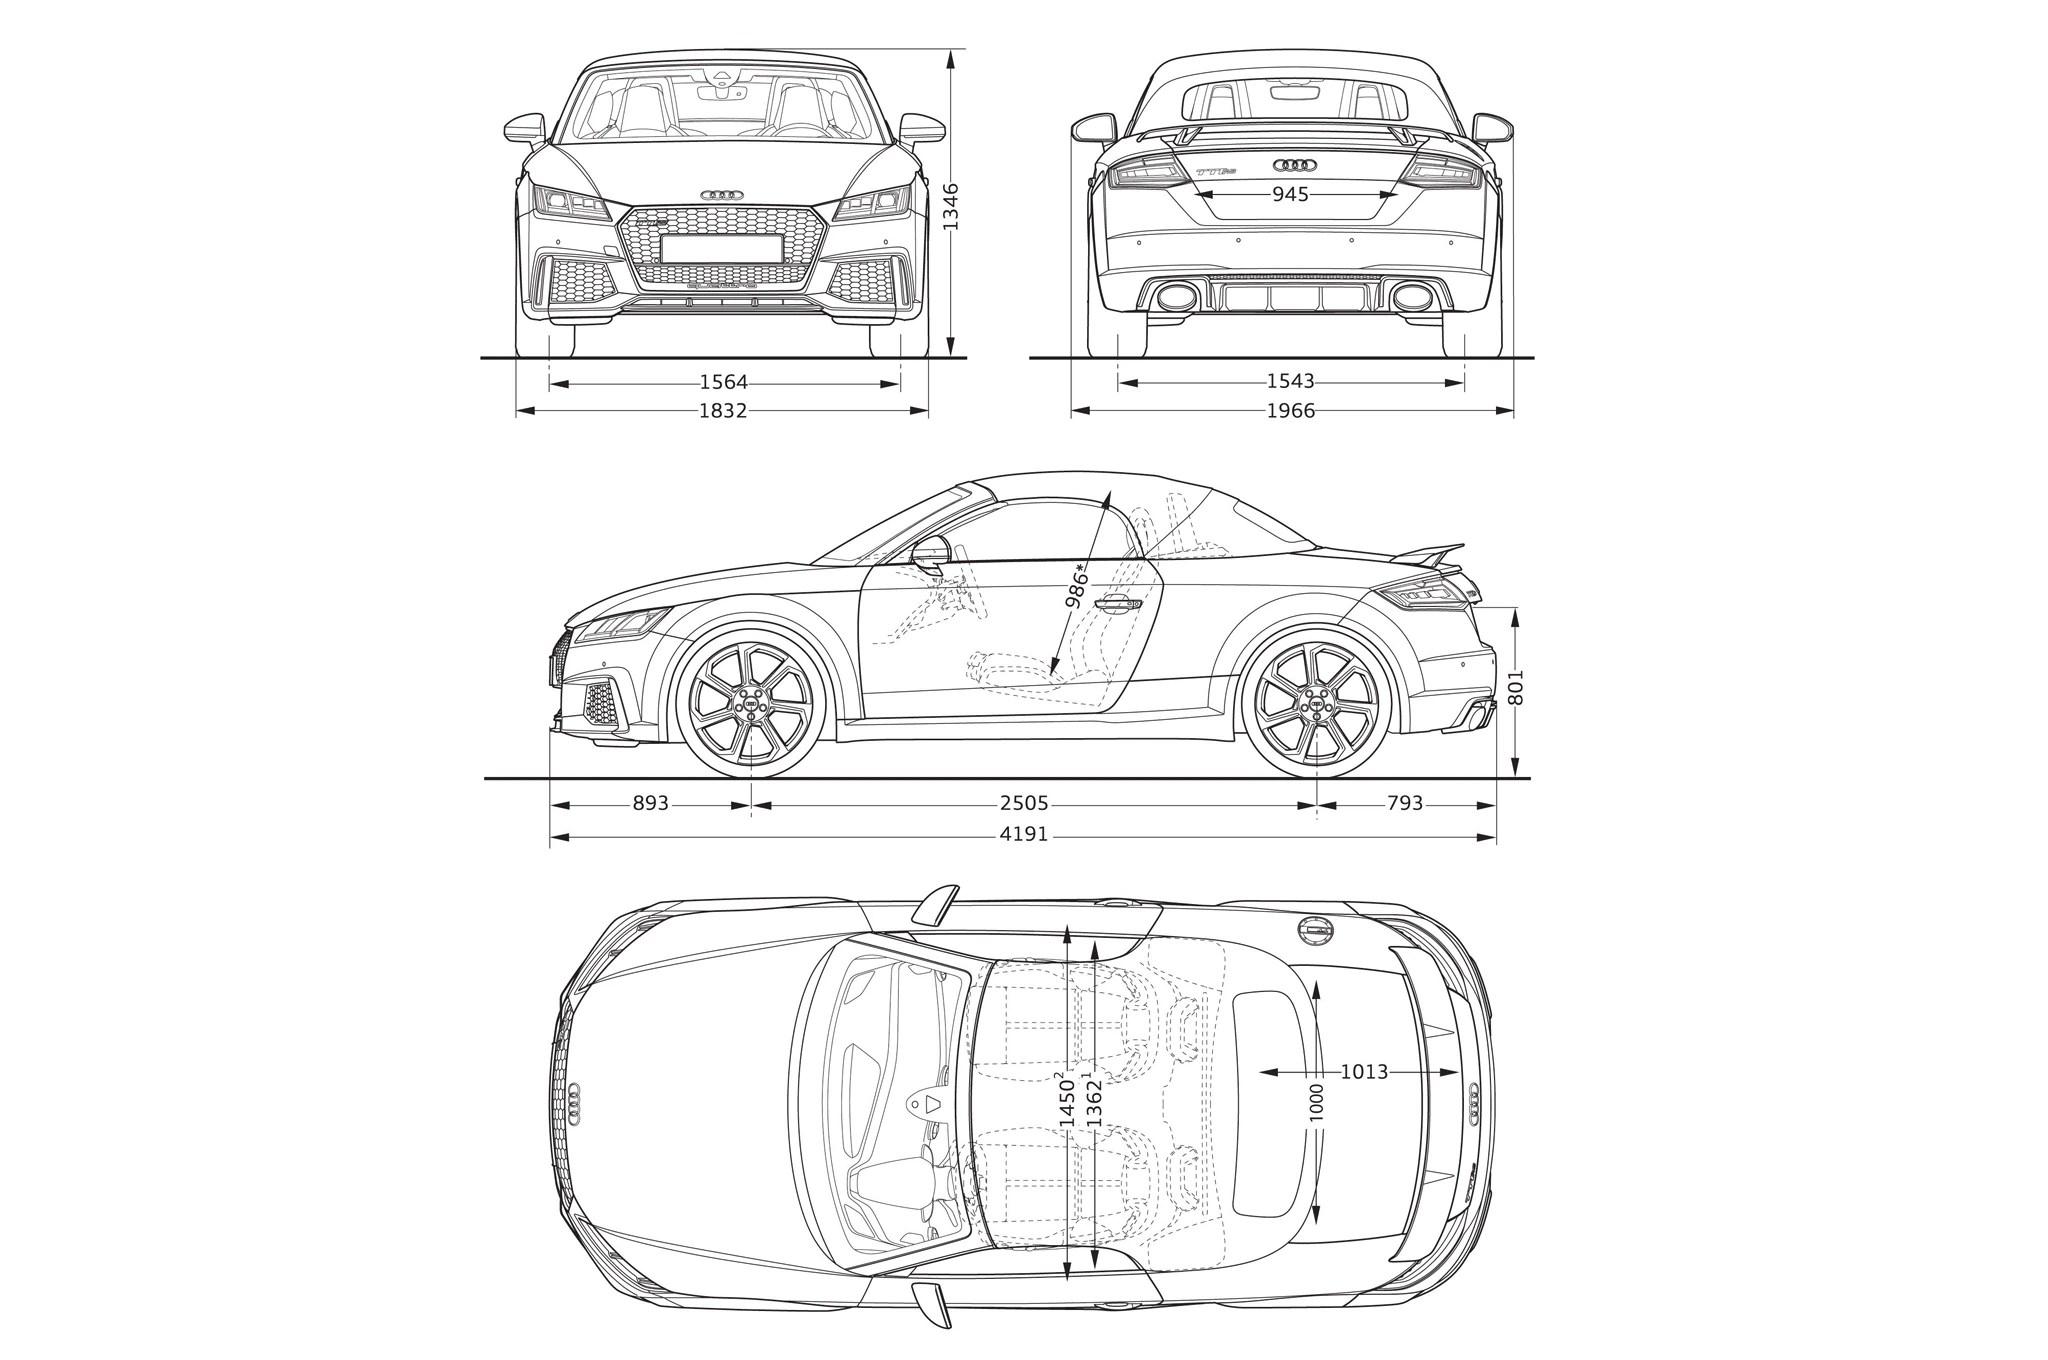 Audi TT RS 2017 llega con motor de cinco cilindros